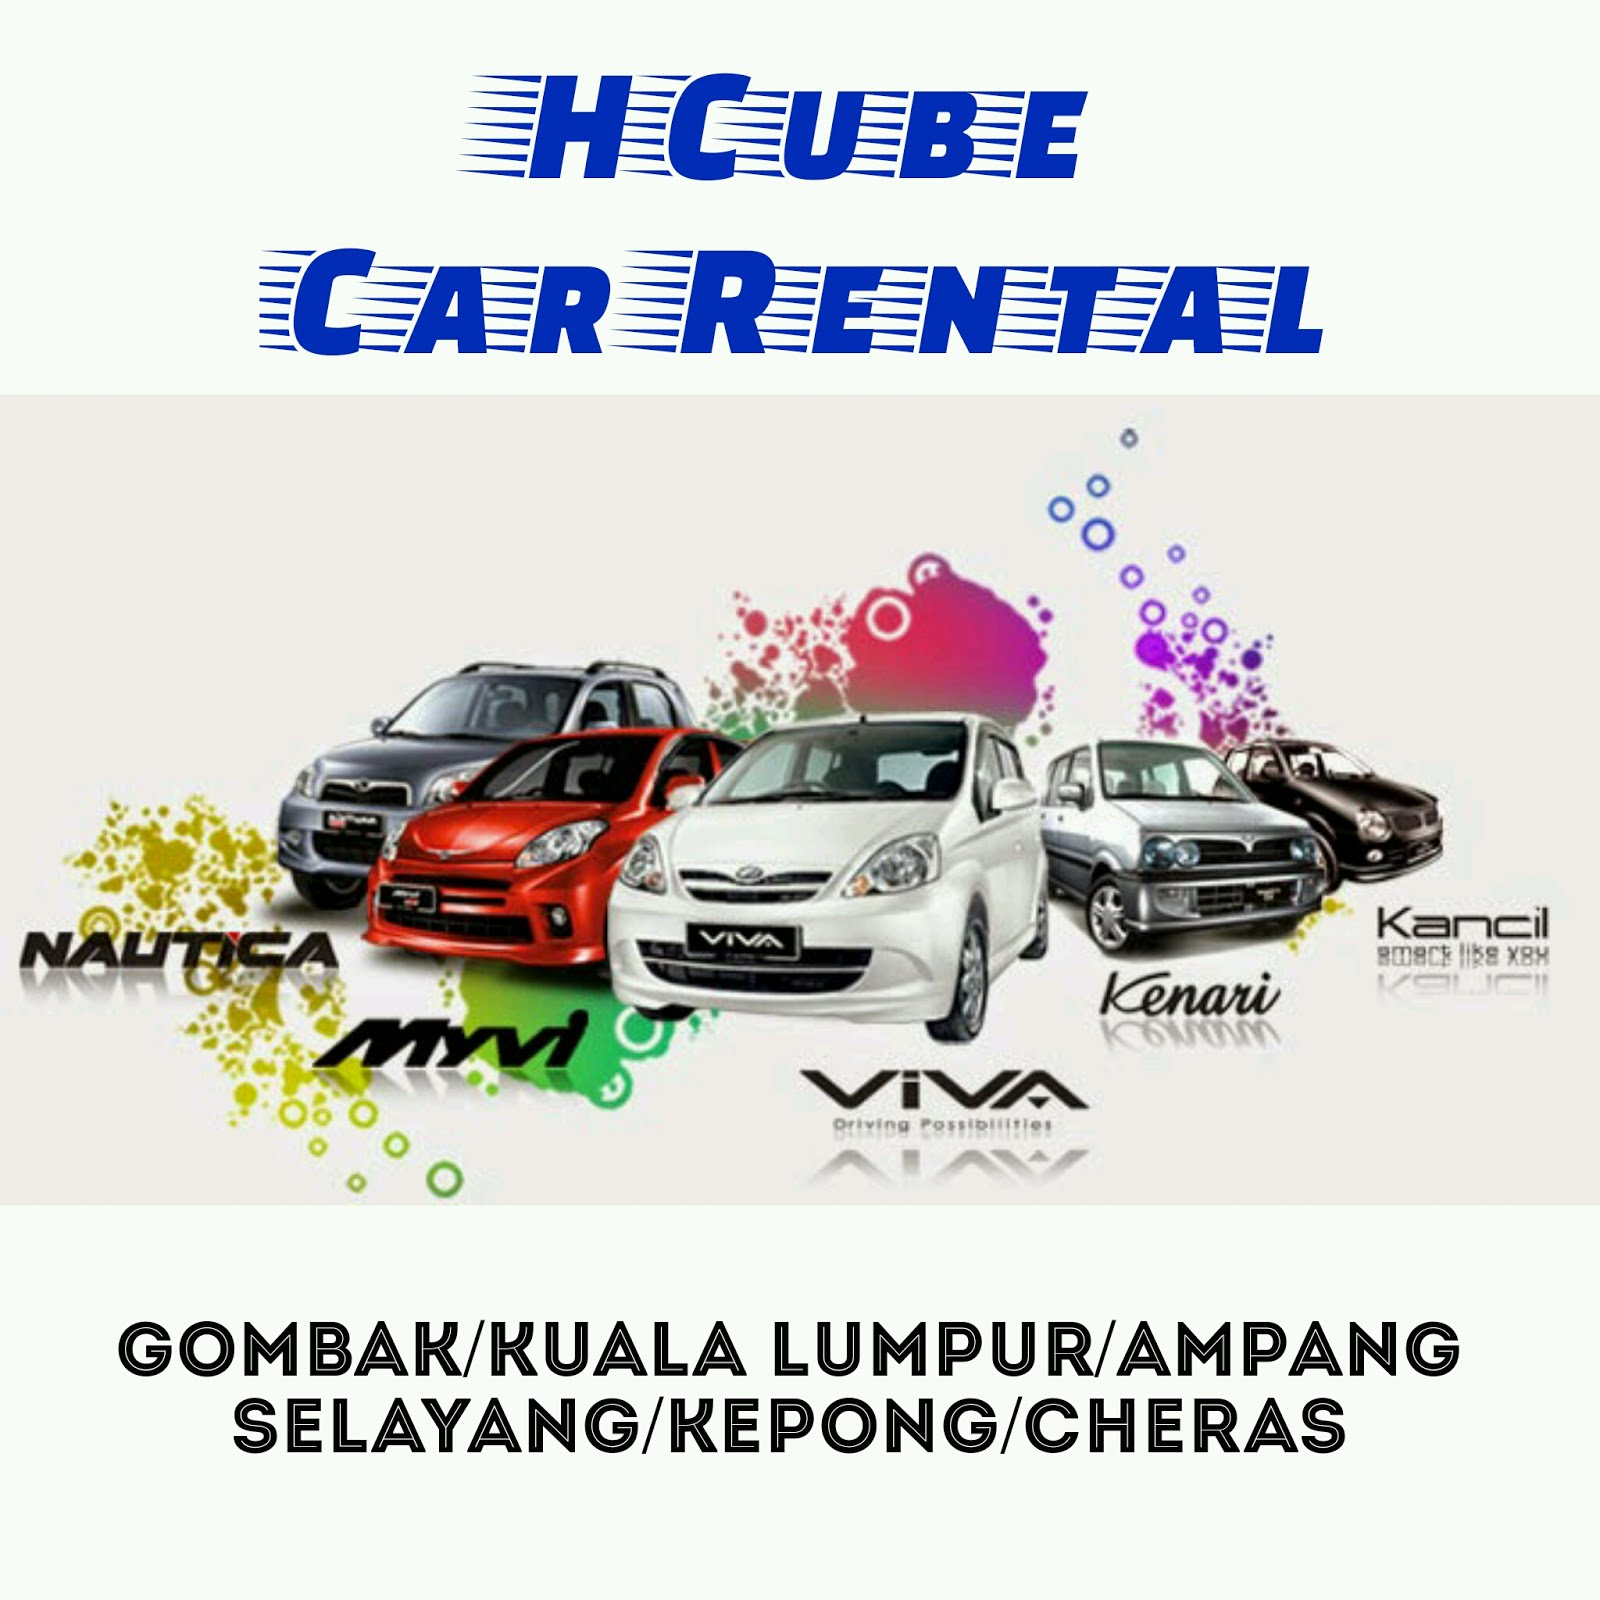 HCUBE CAR RENTAL